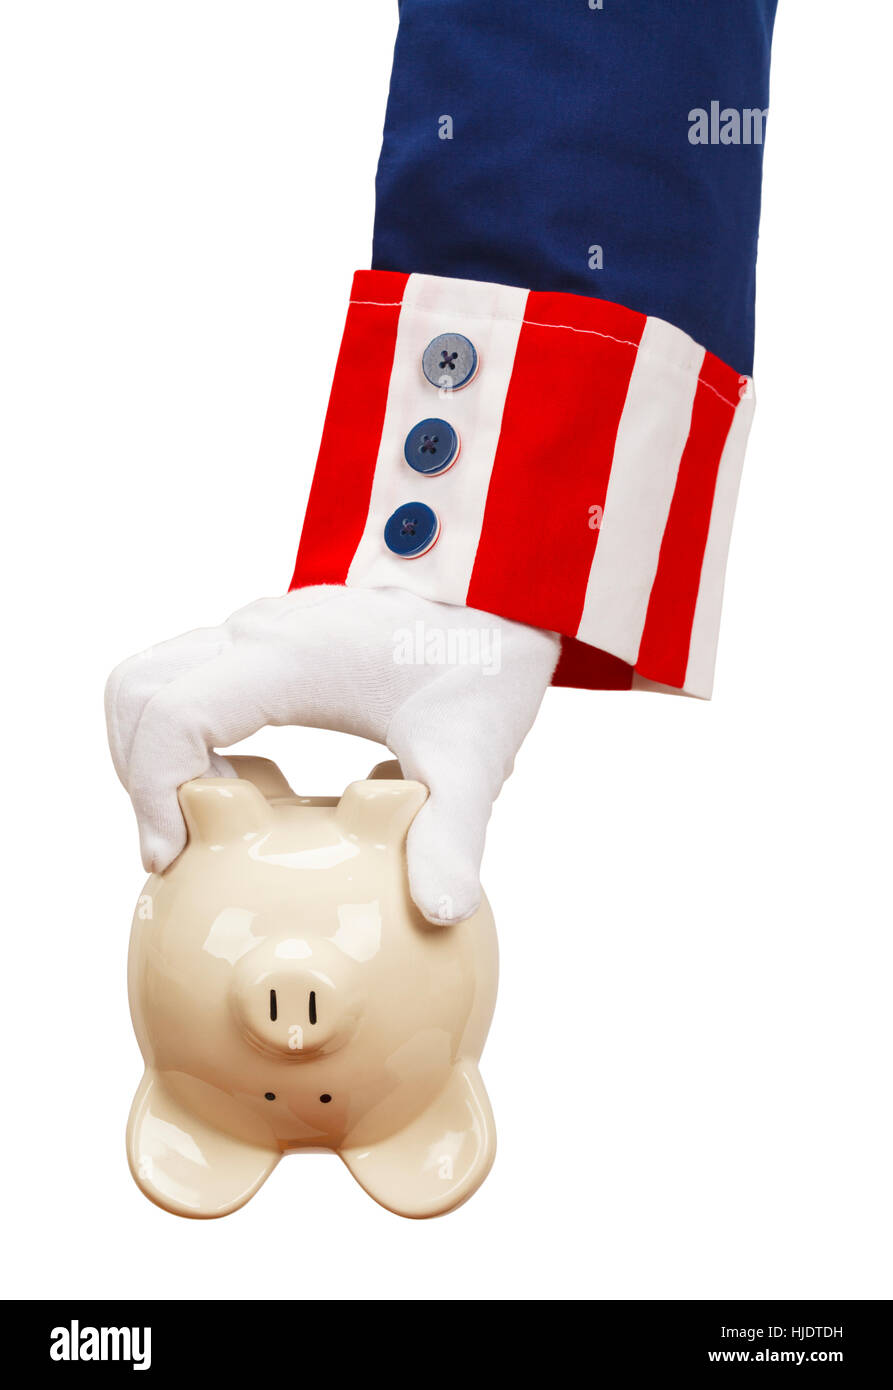 President Holding Empty Piggy Bank Isolated on White Background. - Stock Image